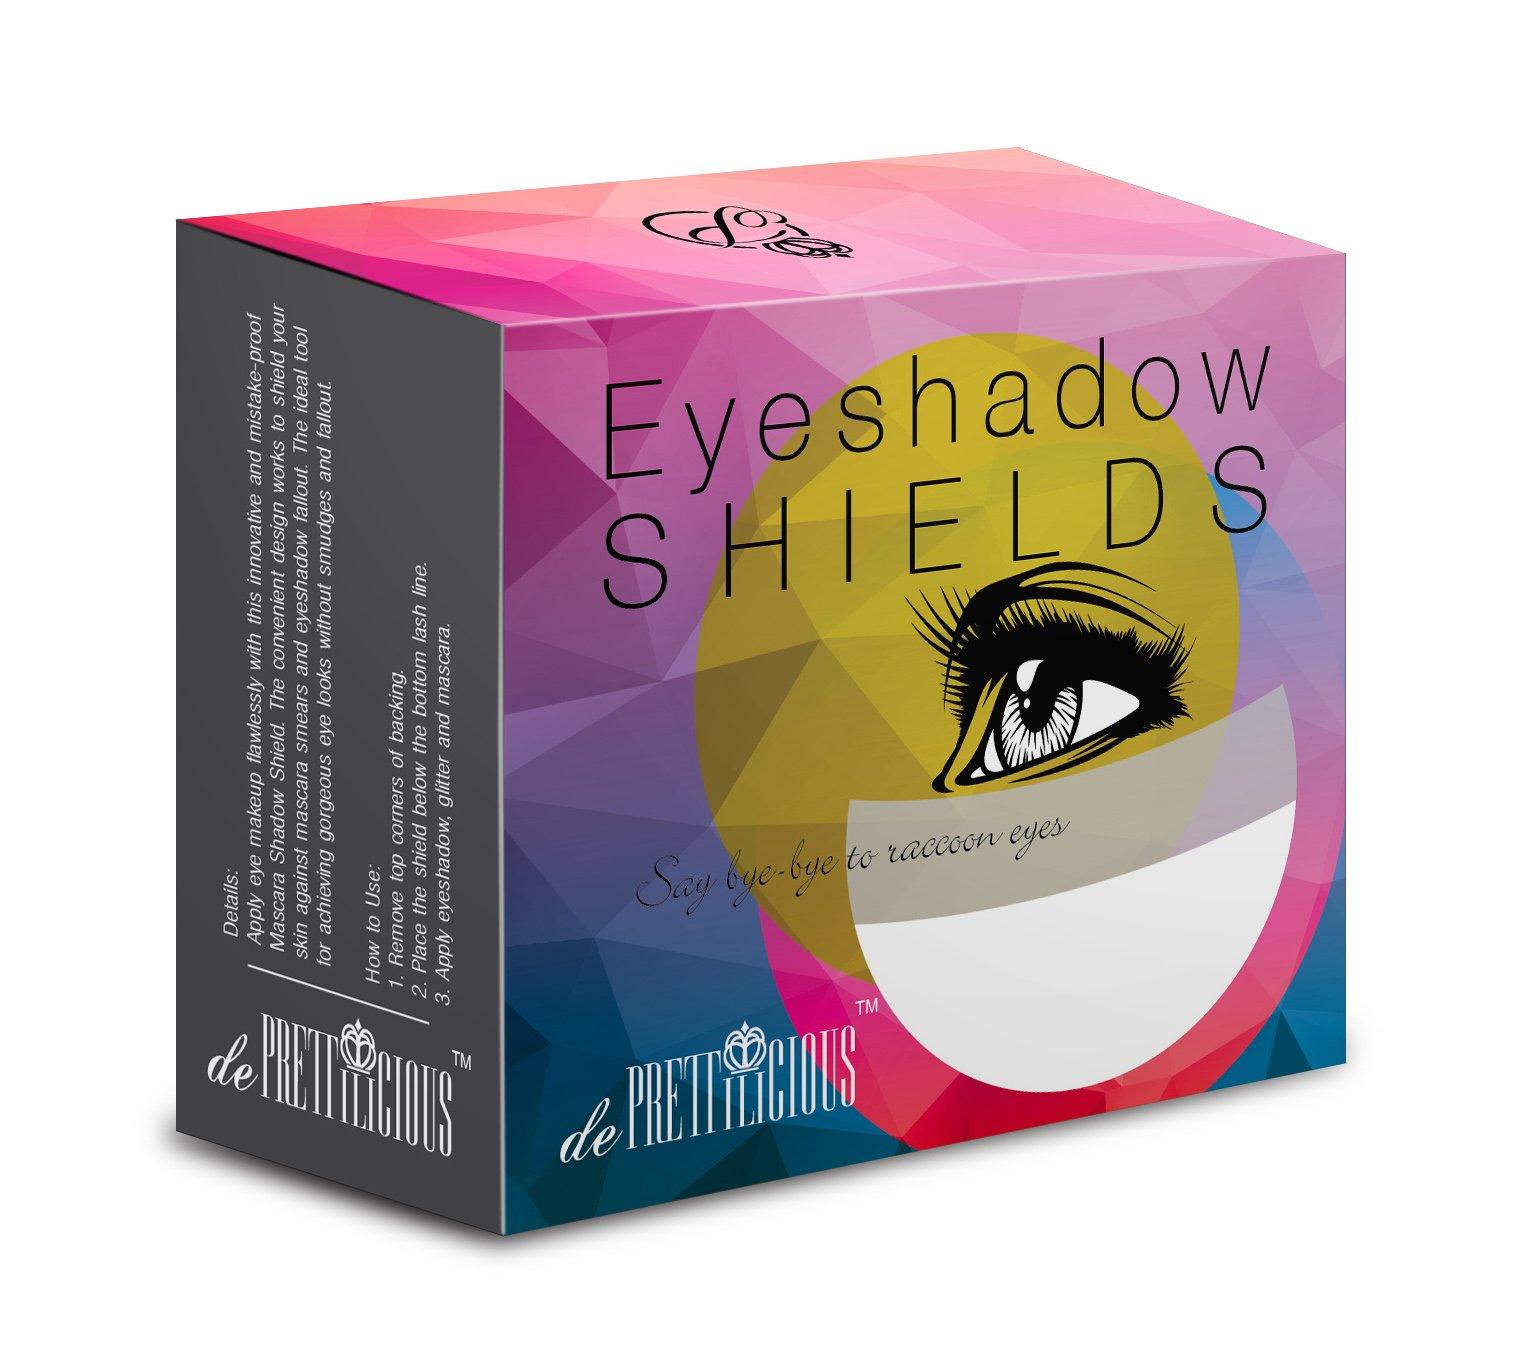 de Prettilicious Eyeshadow Shield 100 pieces. FREE BEAUTY E-BOOK. Eye Shadow Shields Mascara Eyelash Guard Protector Cosmetic Application